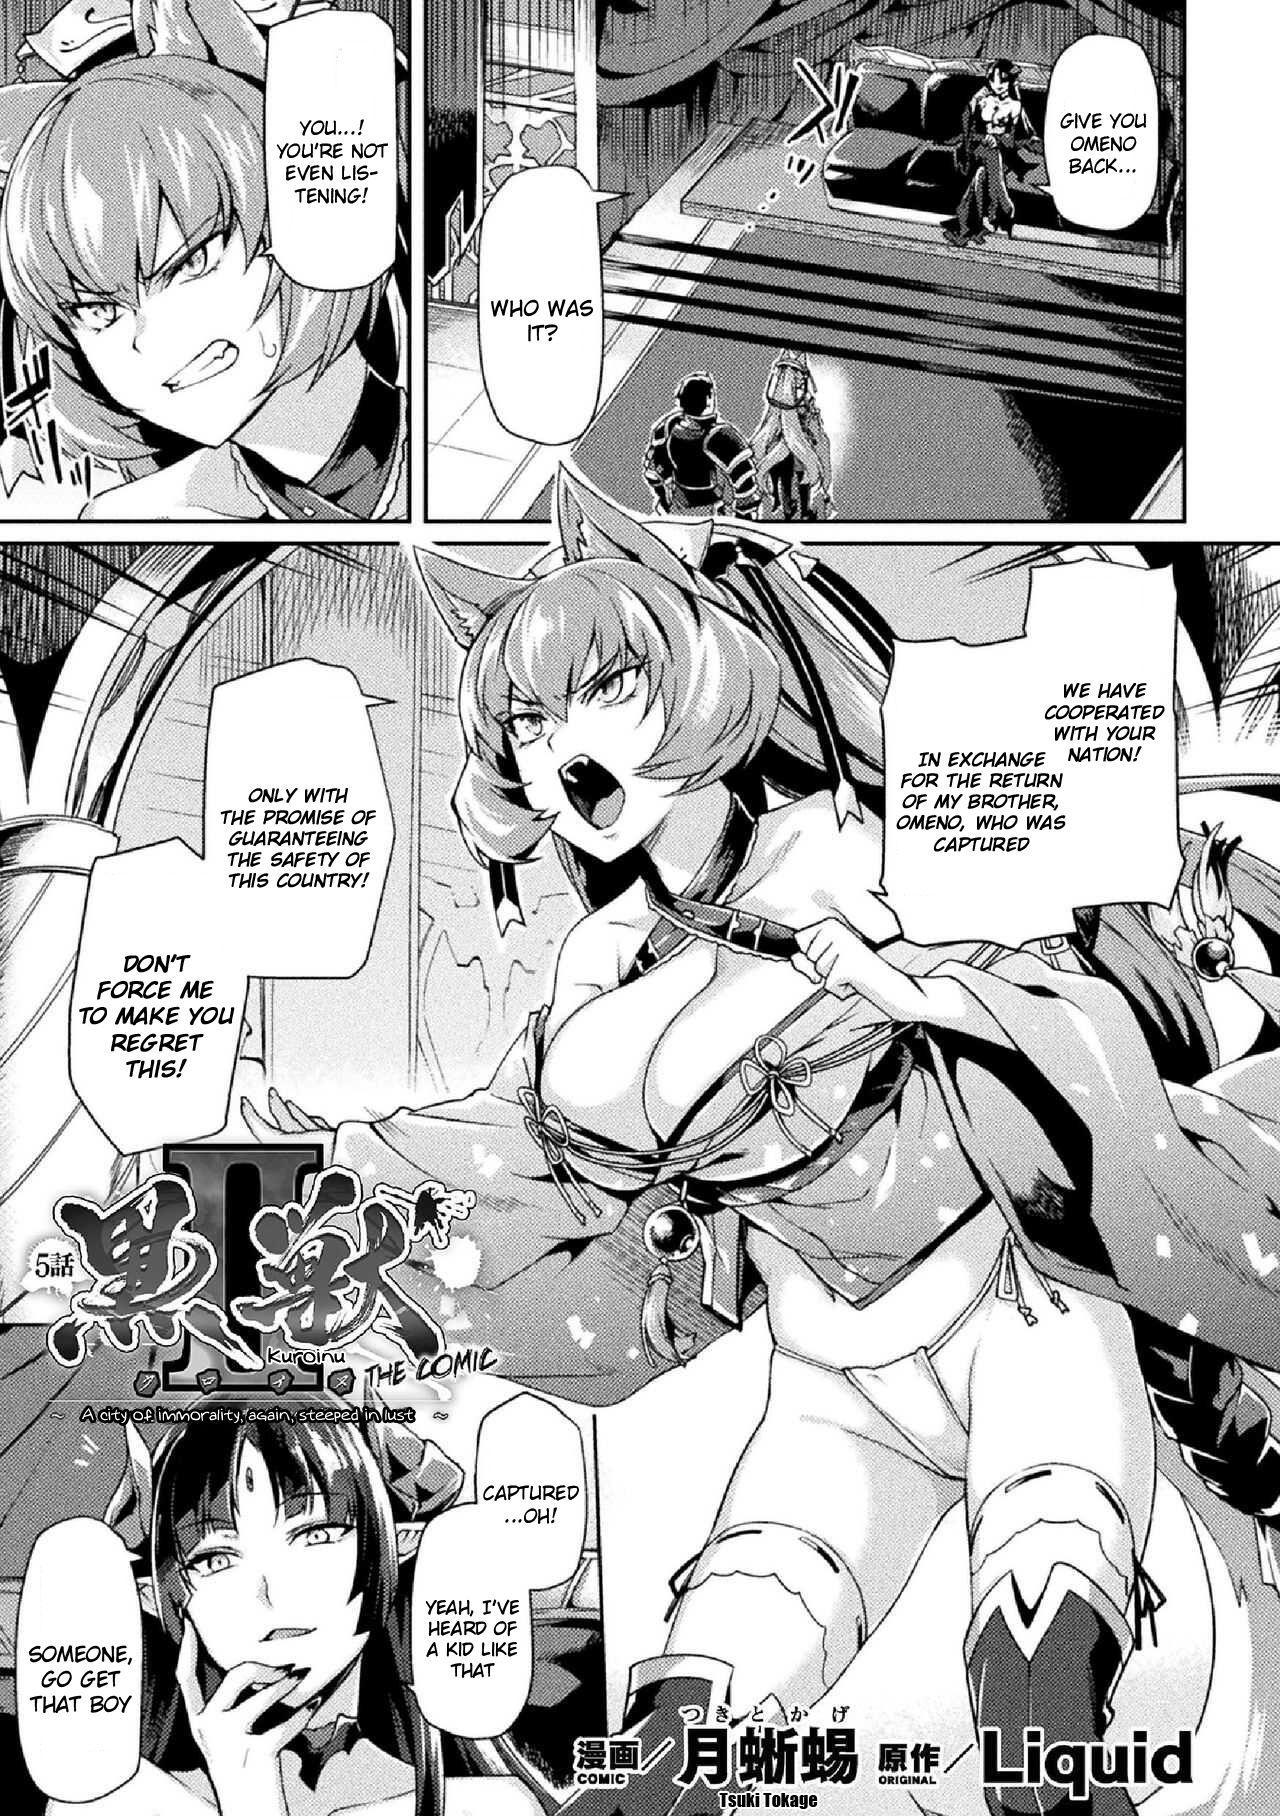 [Tsukitokage] Kuroinu II ~Inyoku ni Somaru Haitoku no Miyako, Futatabi~ THE COMIC Chapter 5 (Kukkoro Heroines Vol. 5) [Digital] [English] [Decensored] (Klub Kemoner) 0